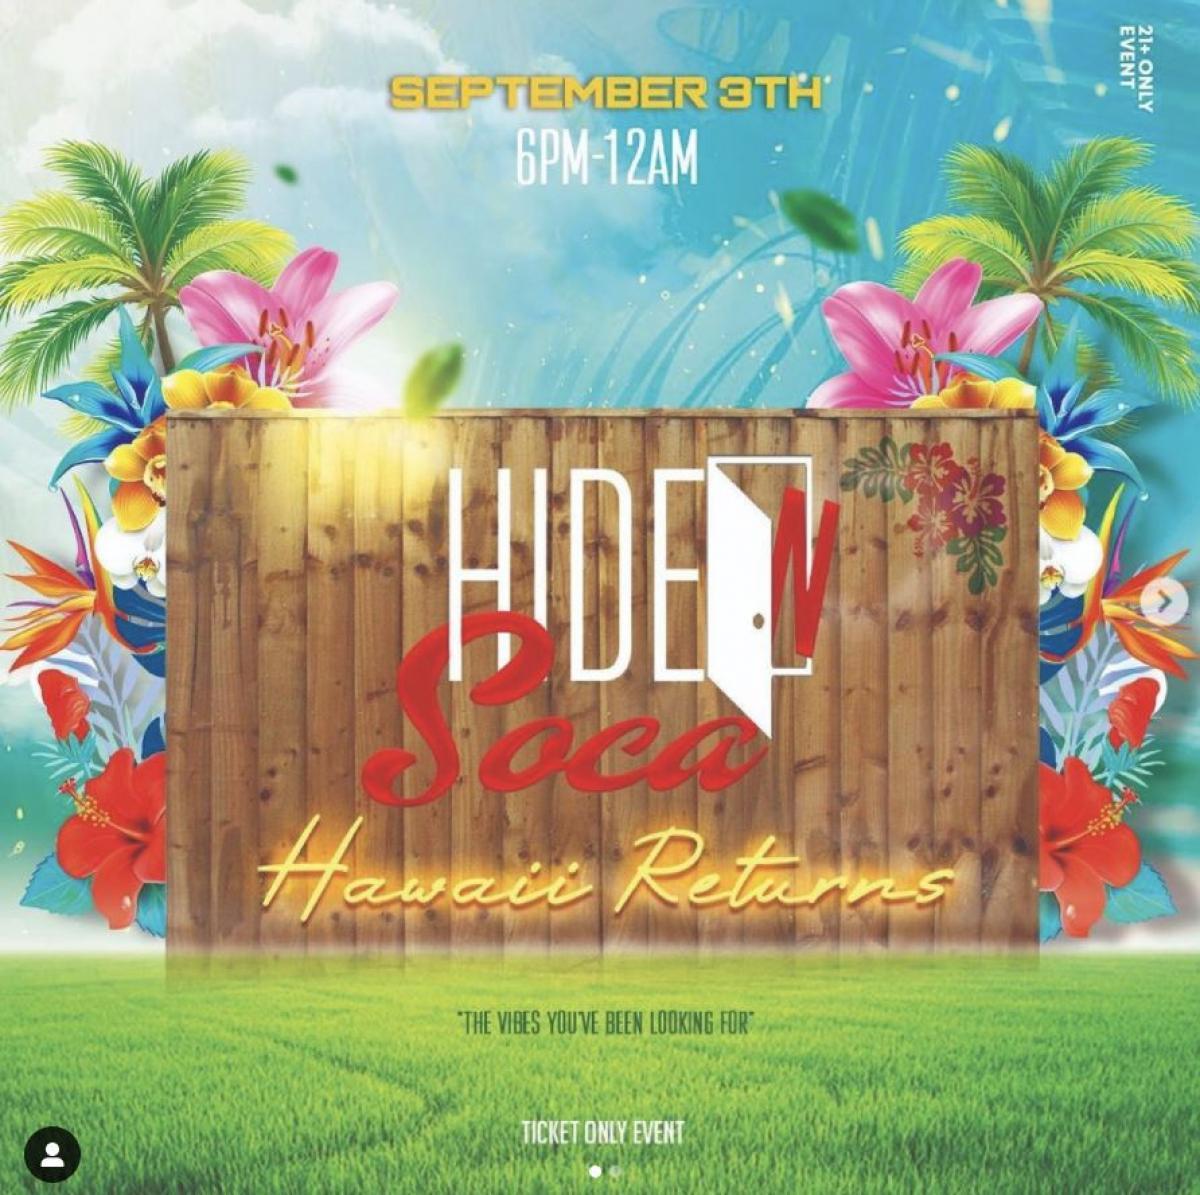 Hide N Soca: Hawaii flyer or graphic.